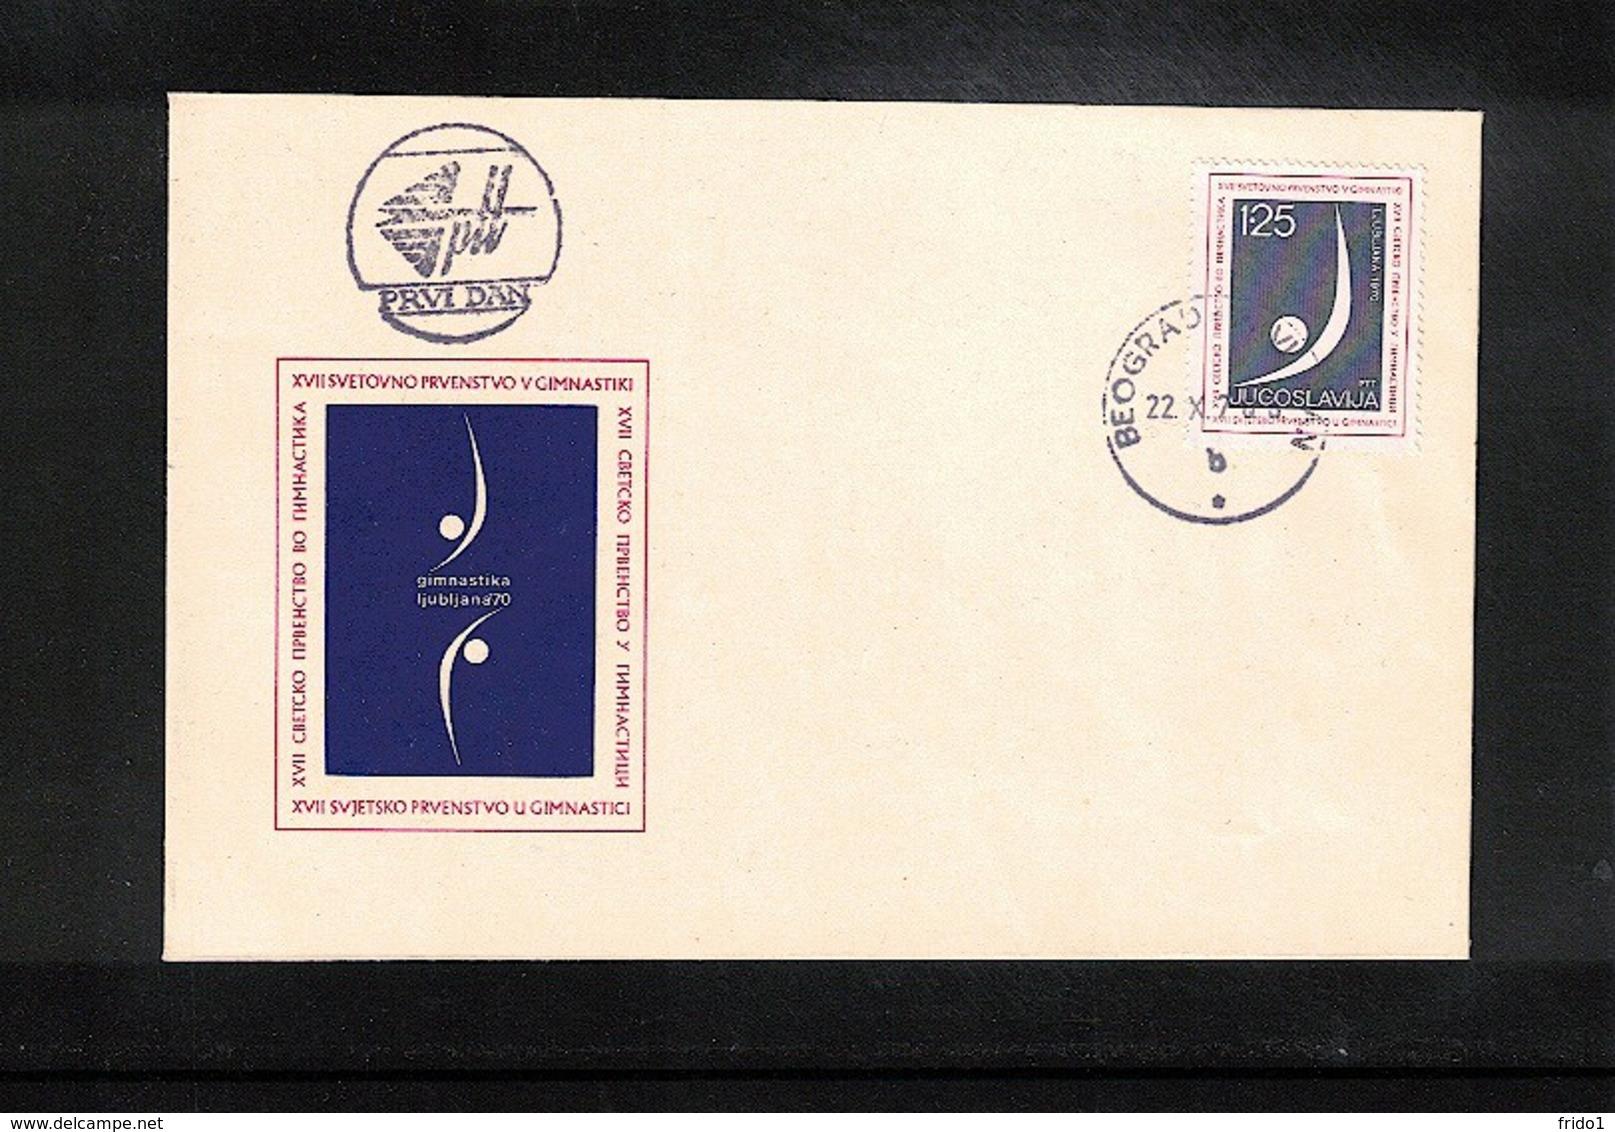 Yugoslavia / Jugoslawien 1970 Ljubljana World Gymnastics Championship Interesting Cover FDC - Gymnastik